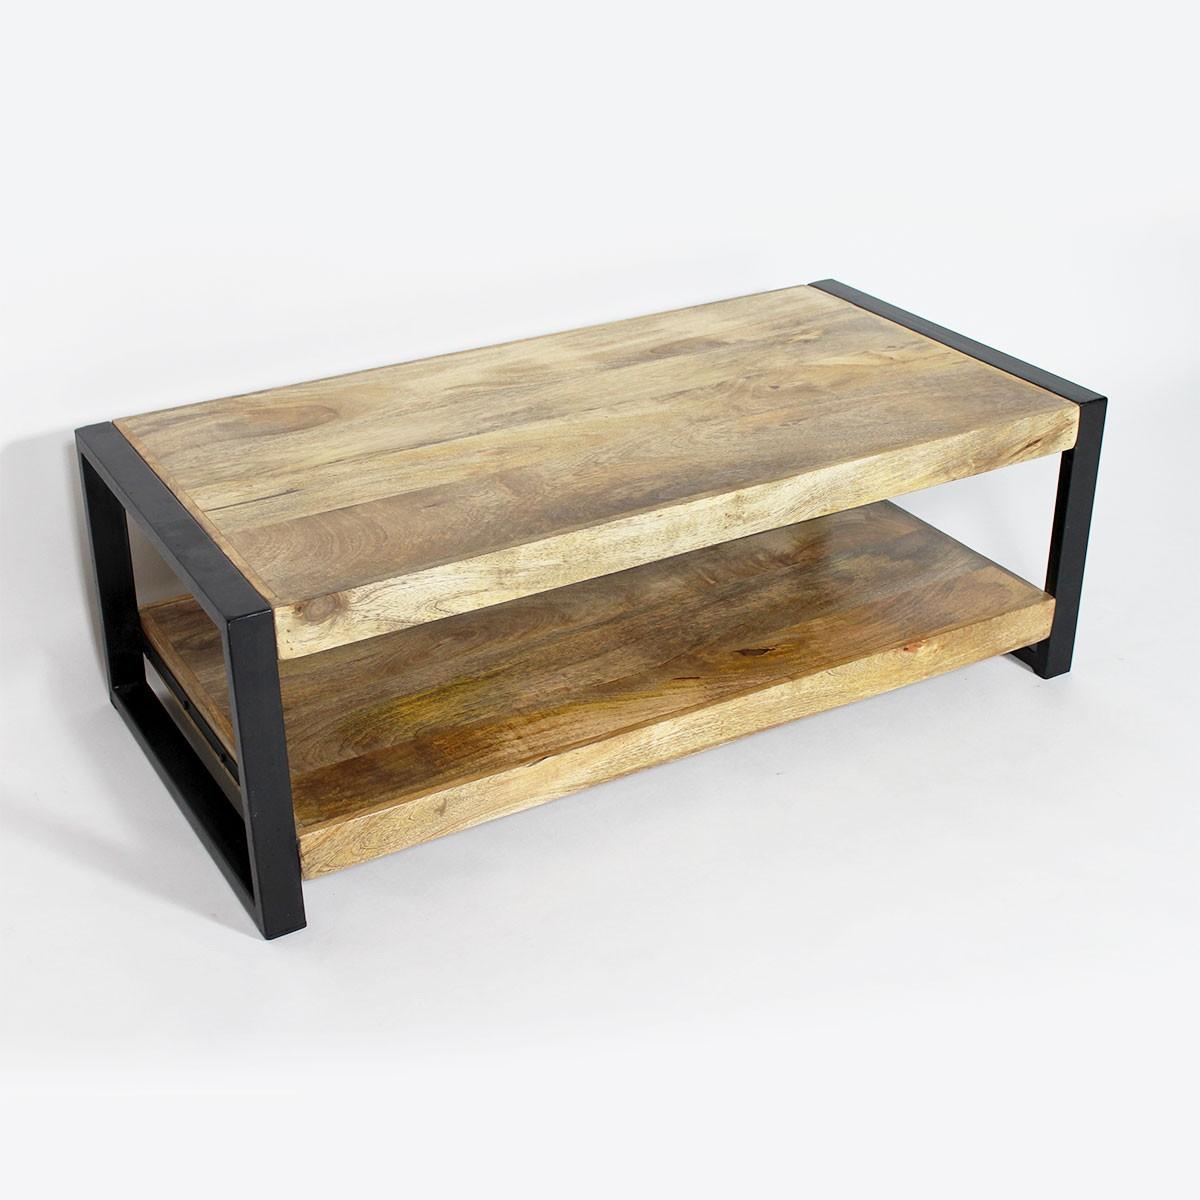 Table basse en bois avec tabouret